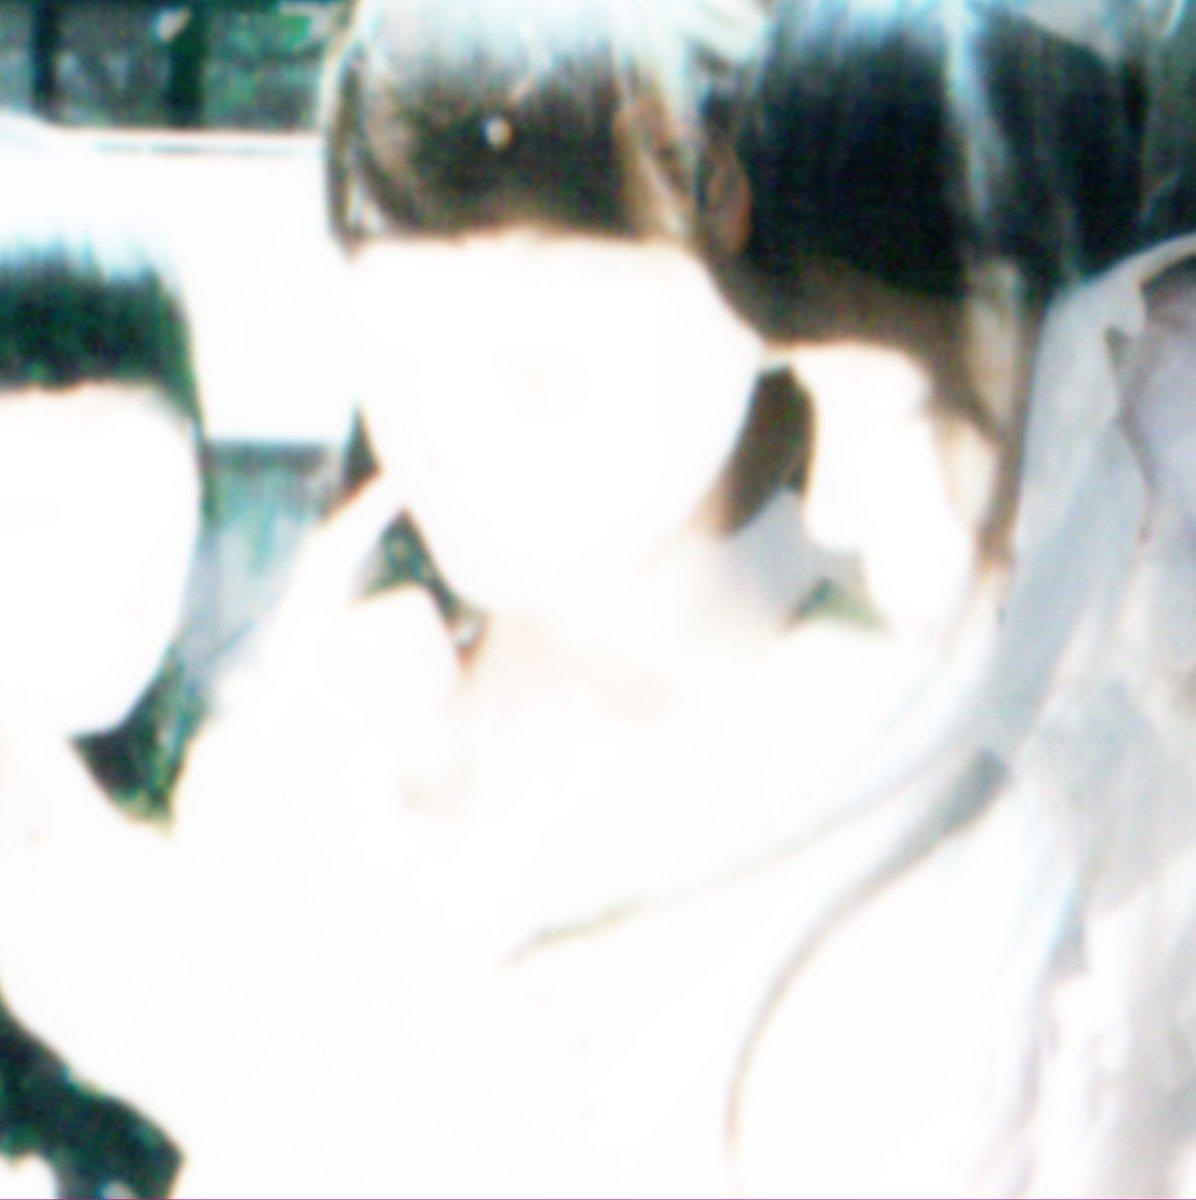 「・・・・・・ tokyo dots」の画像検索結果